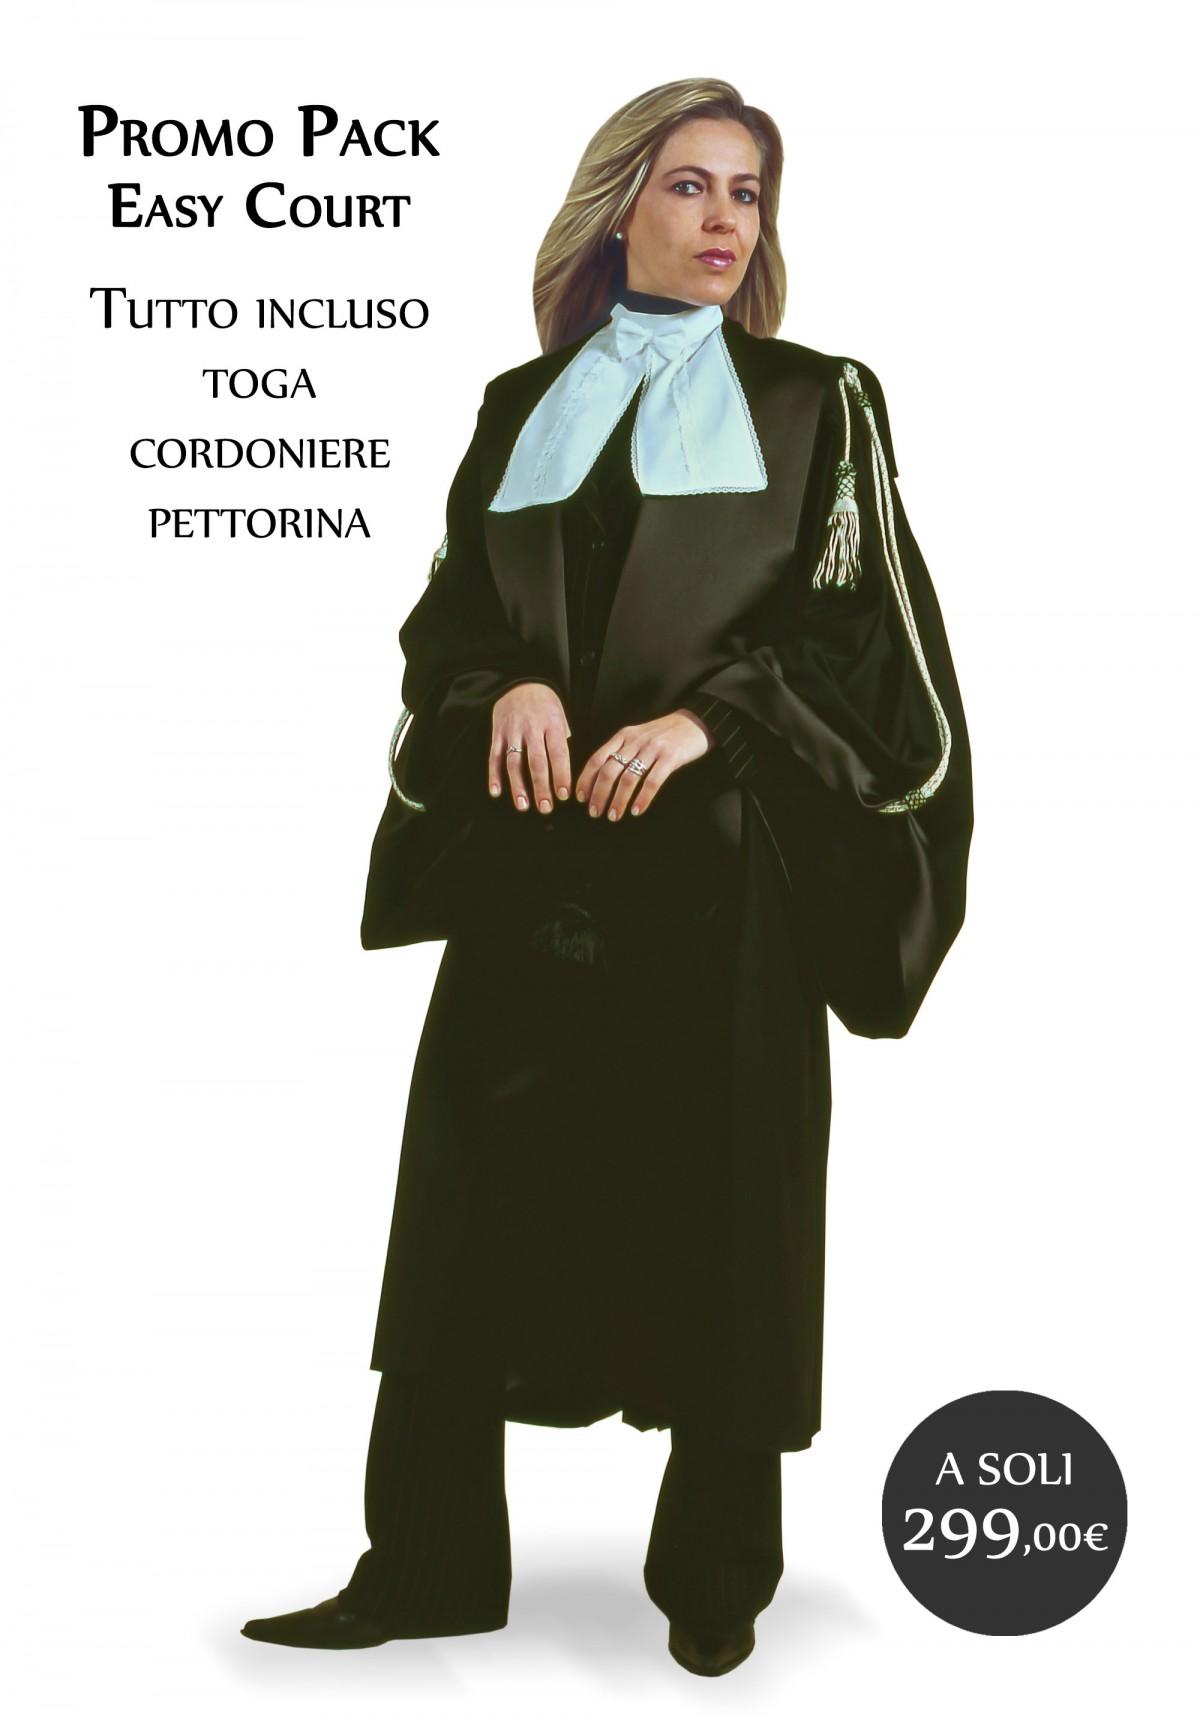 TOGA AVVOCATO UOMO EASY COURT TESSUTO TELA MISTO LANA